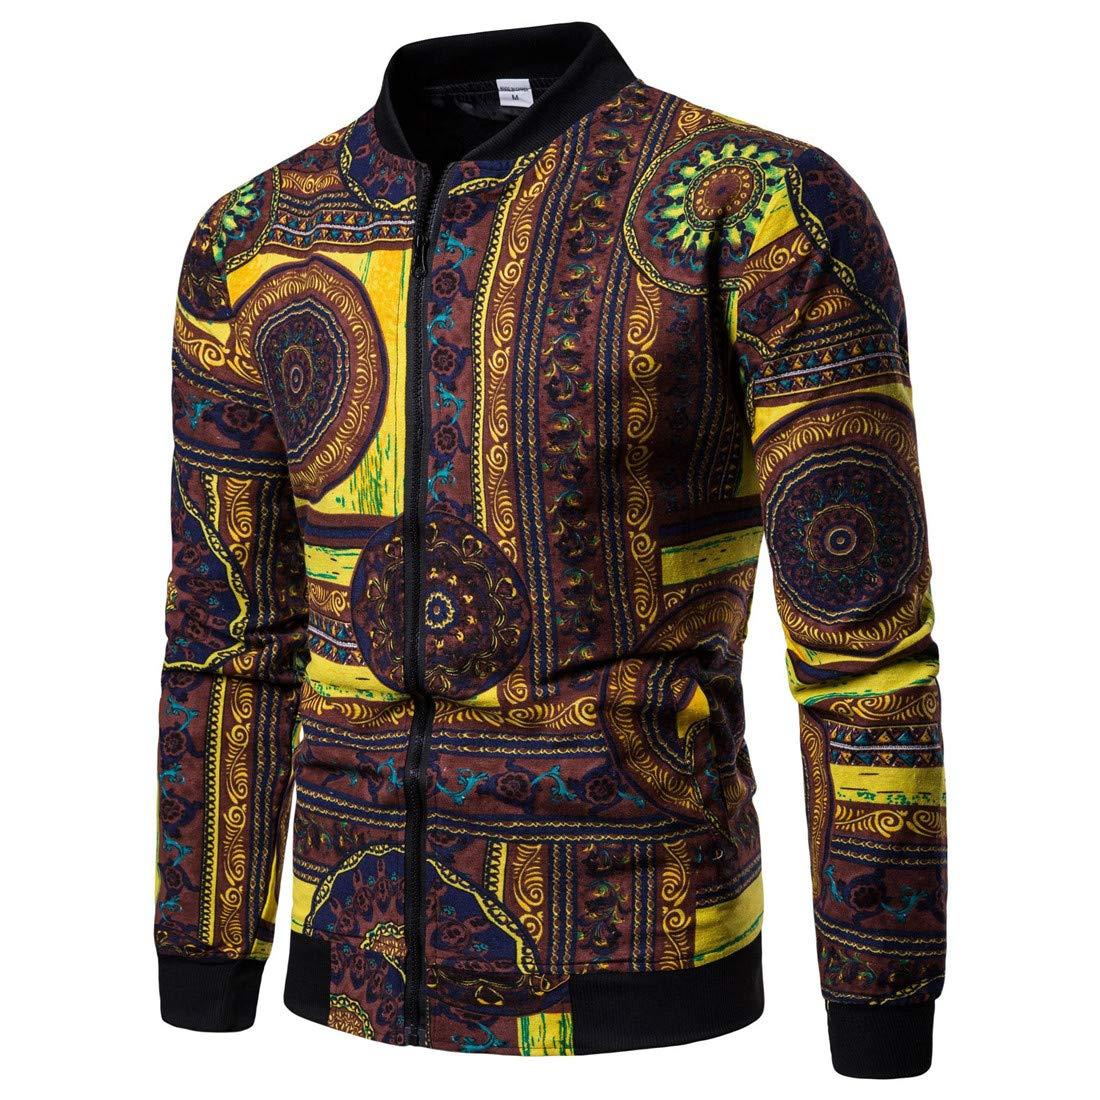 Ueioc Men Casual African Printed Zip-up Slim Fit Bomber Jacket